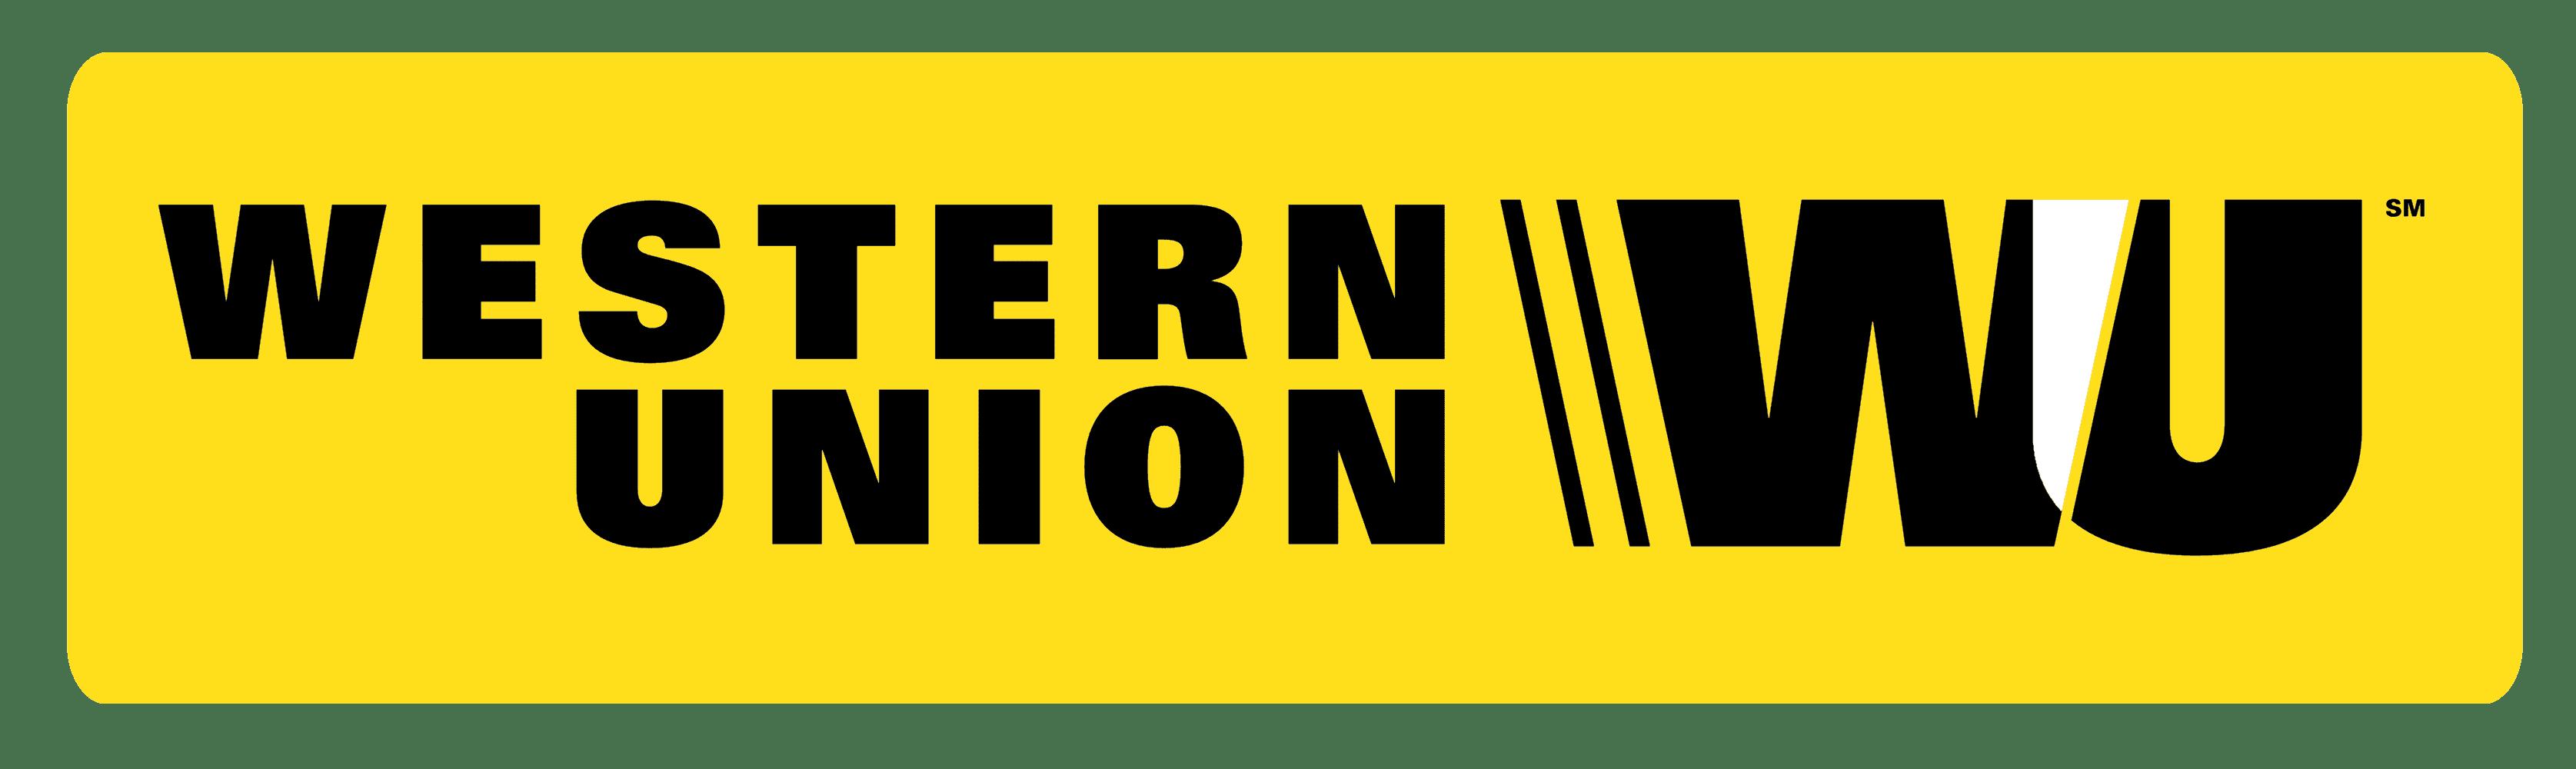 estern obion county umcs - HD3350×1000